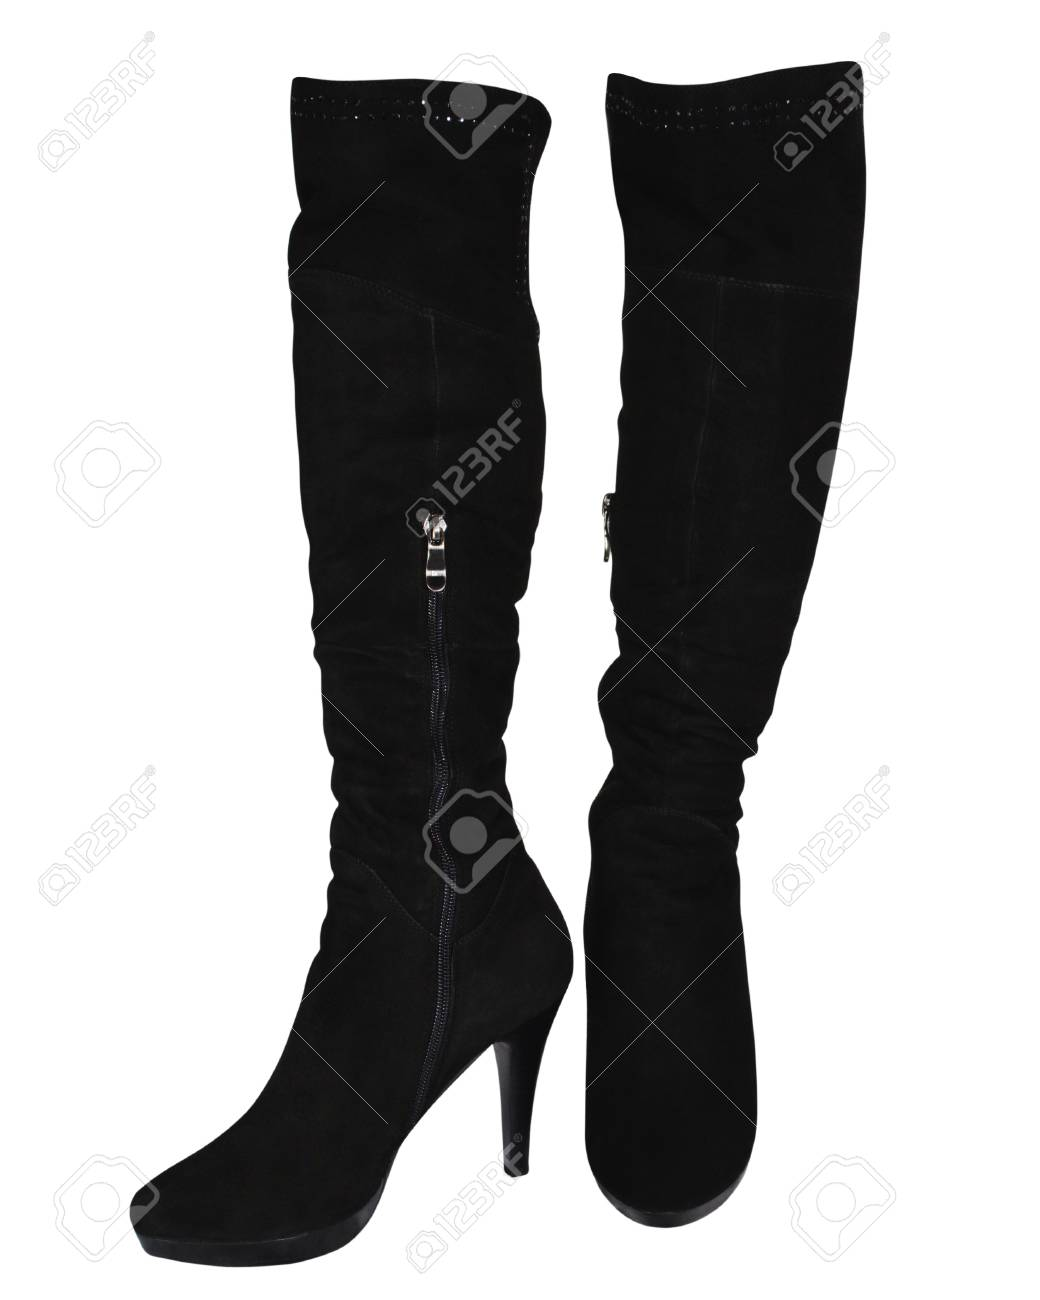 Black Colour On A High Heel Isolated